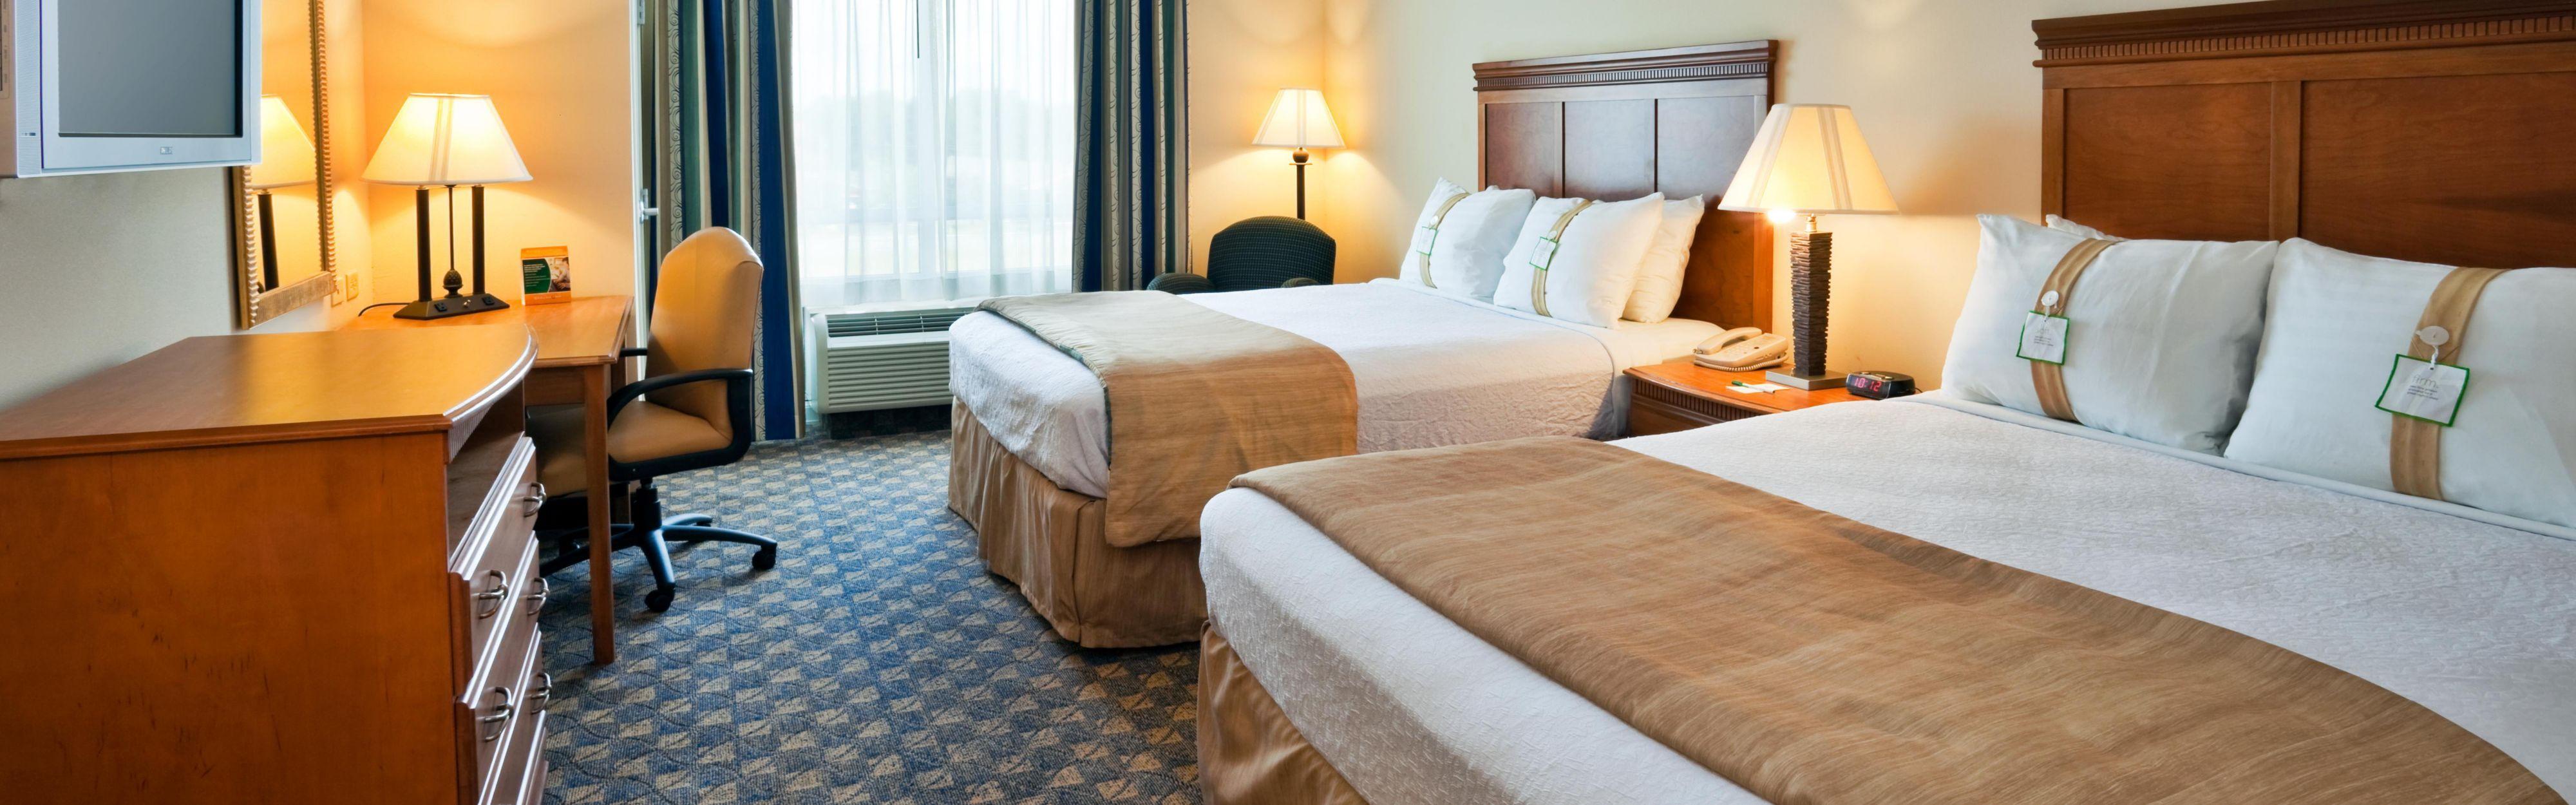 ... Valdosta, GA Holiday Inn Oversized Queen Bed Guest Room ...